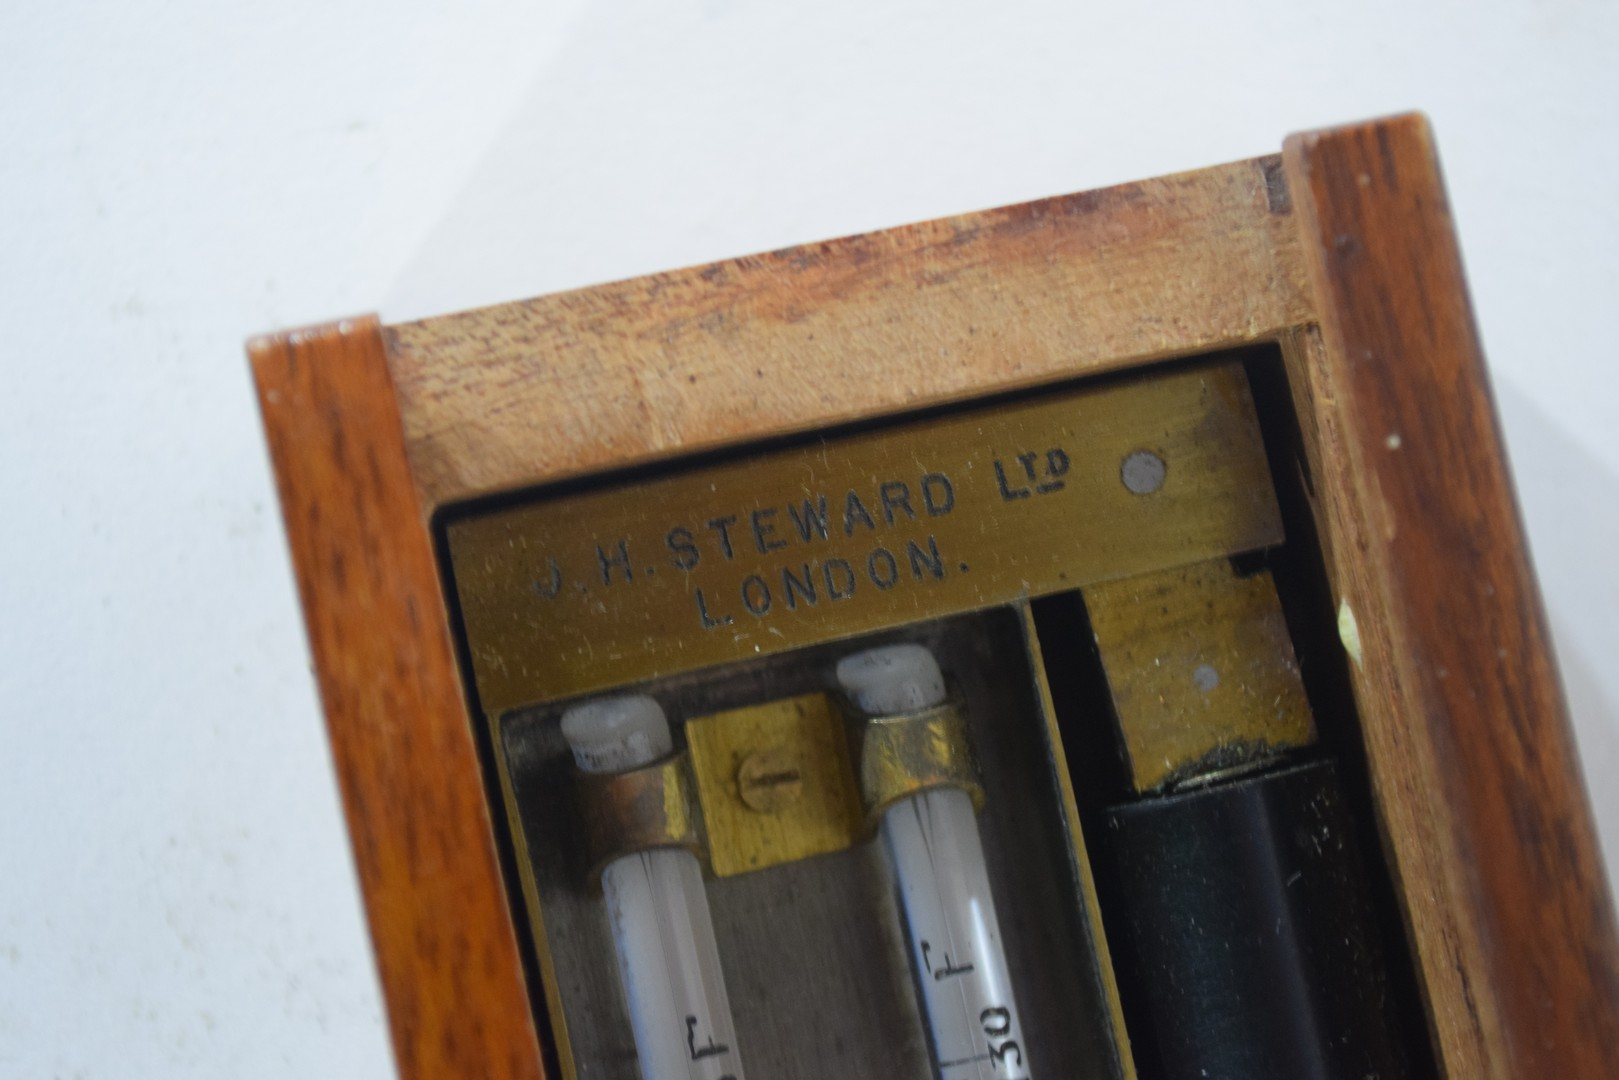 Edney Swing Hygrometer by H Steward Ltd, London - Image 4 of 4